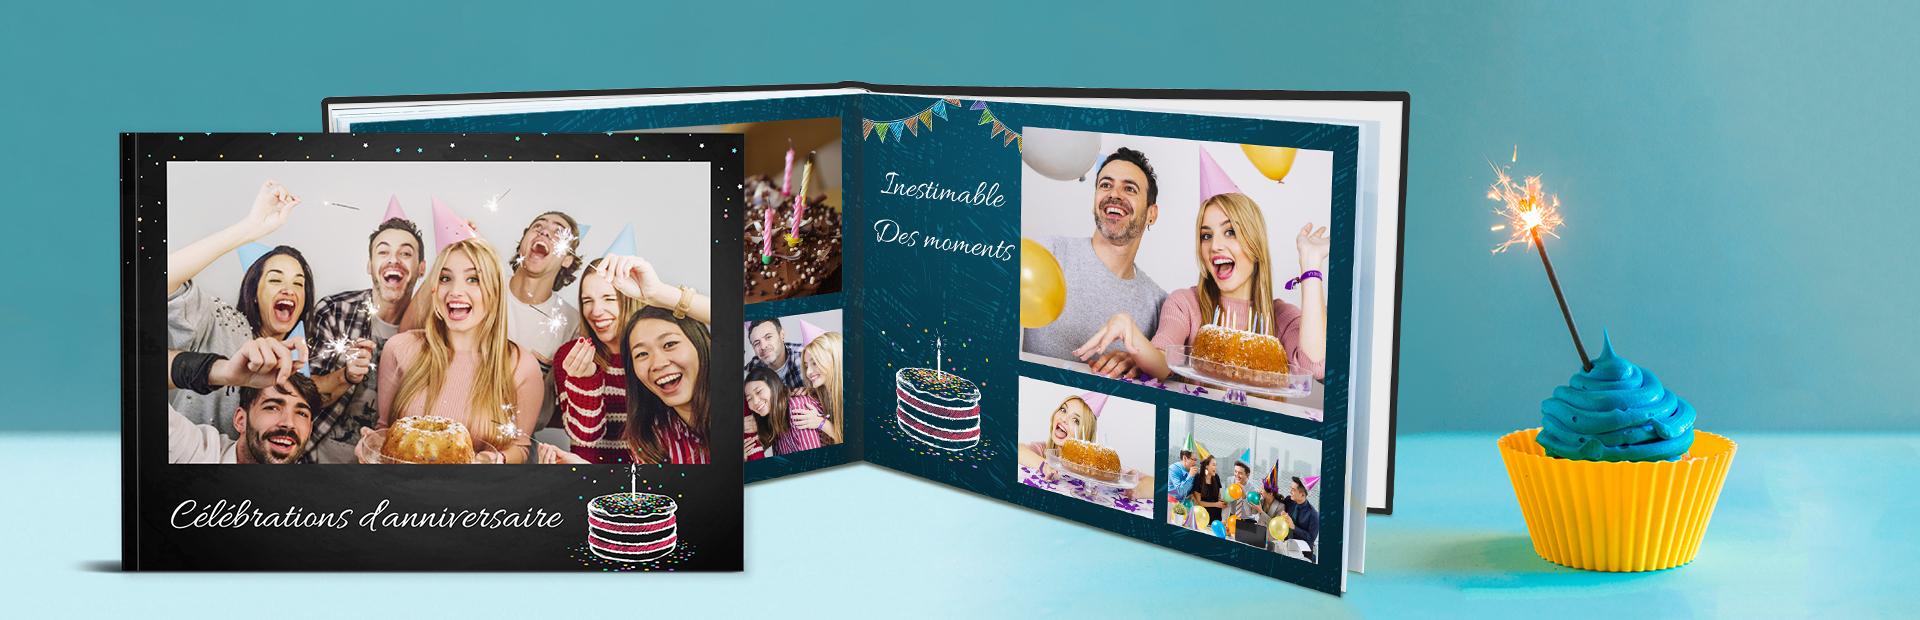 cadeau unique anniversaire Custom Photo Books